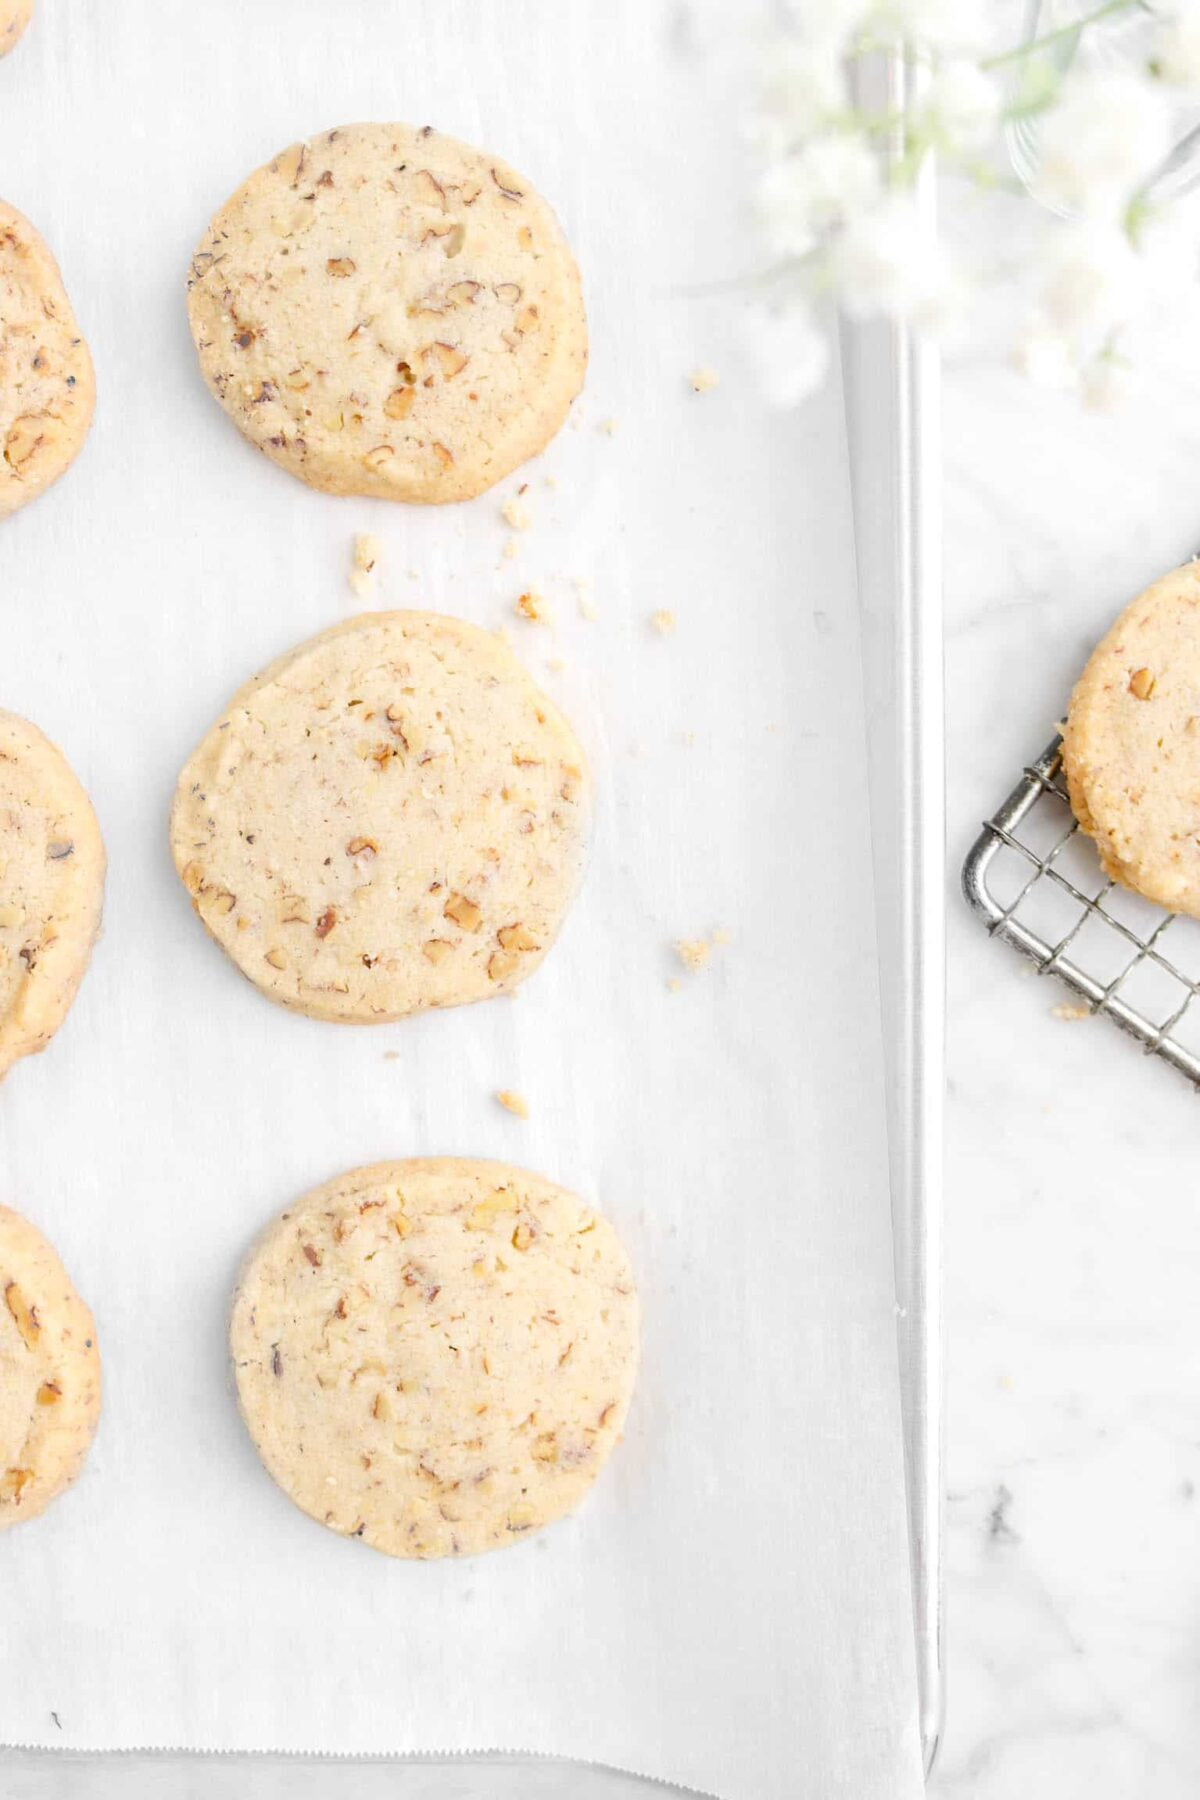 overhead shot of cookies on sheet pan with flowers overhead